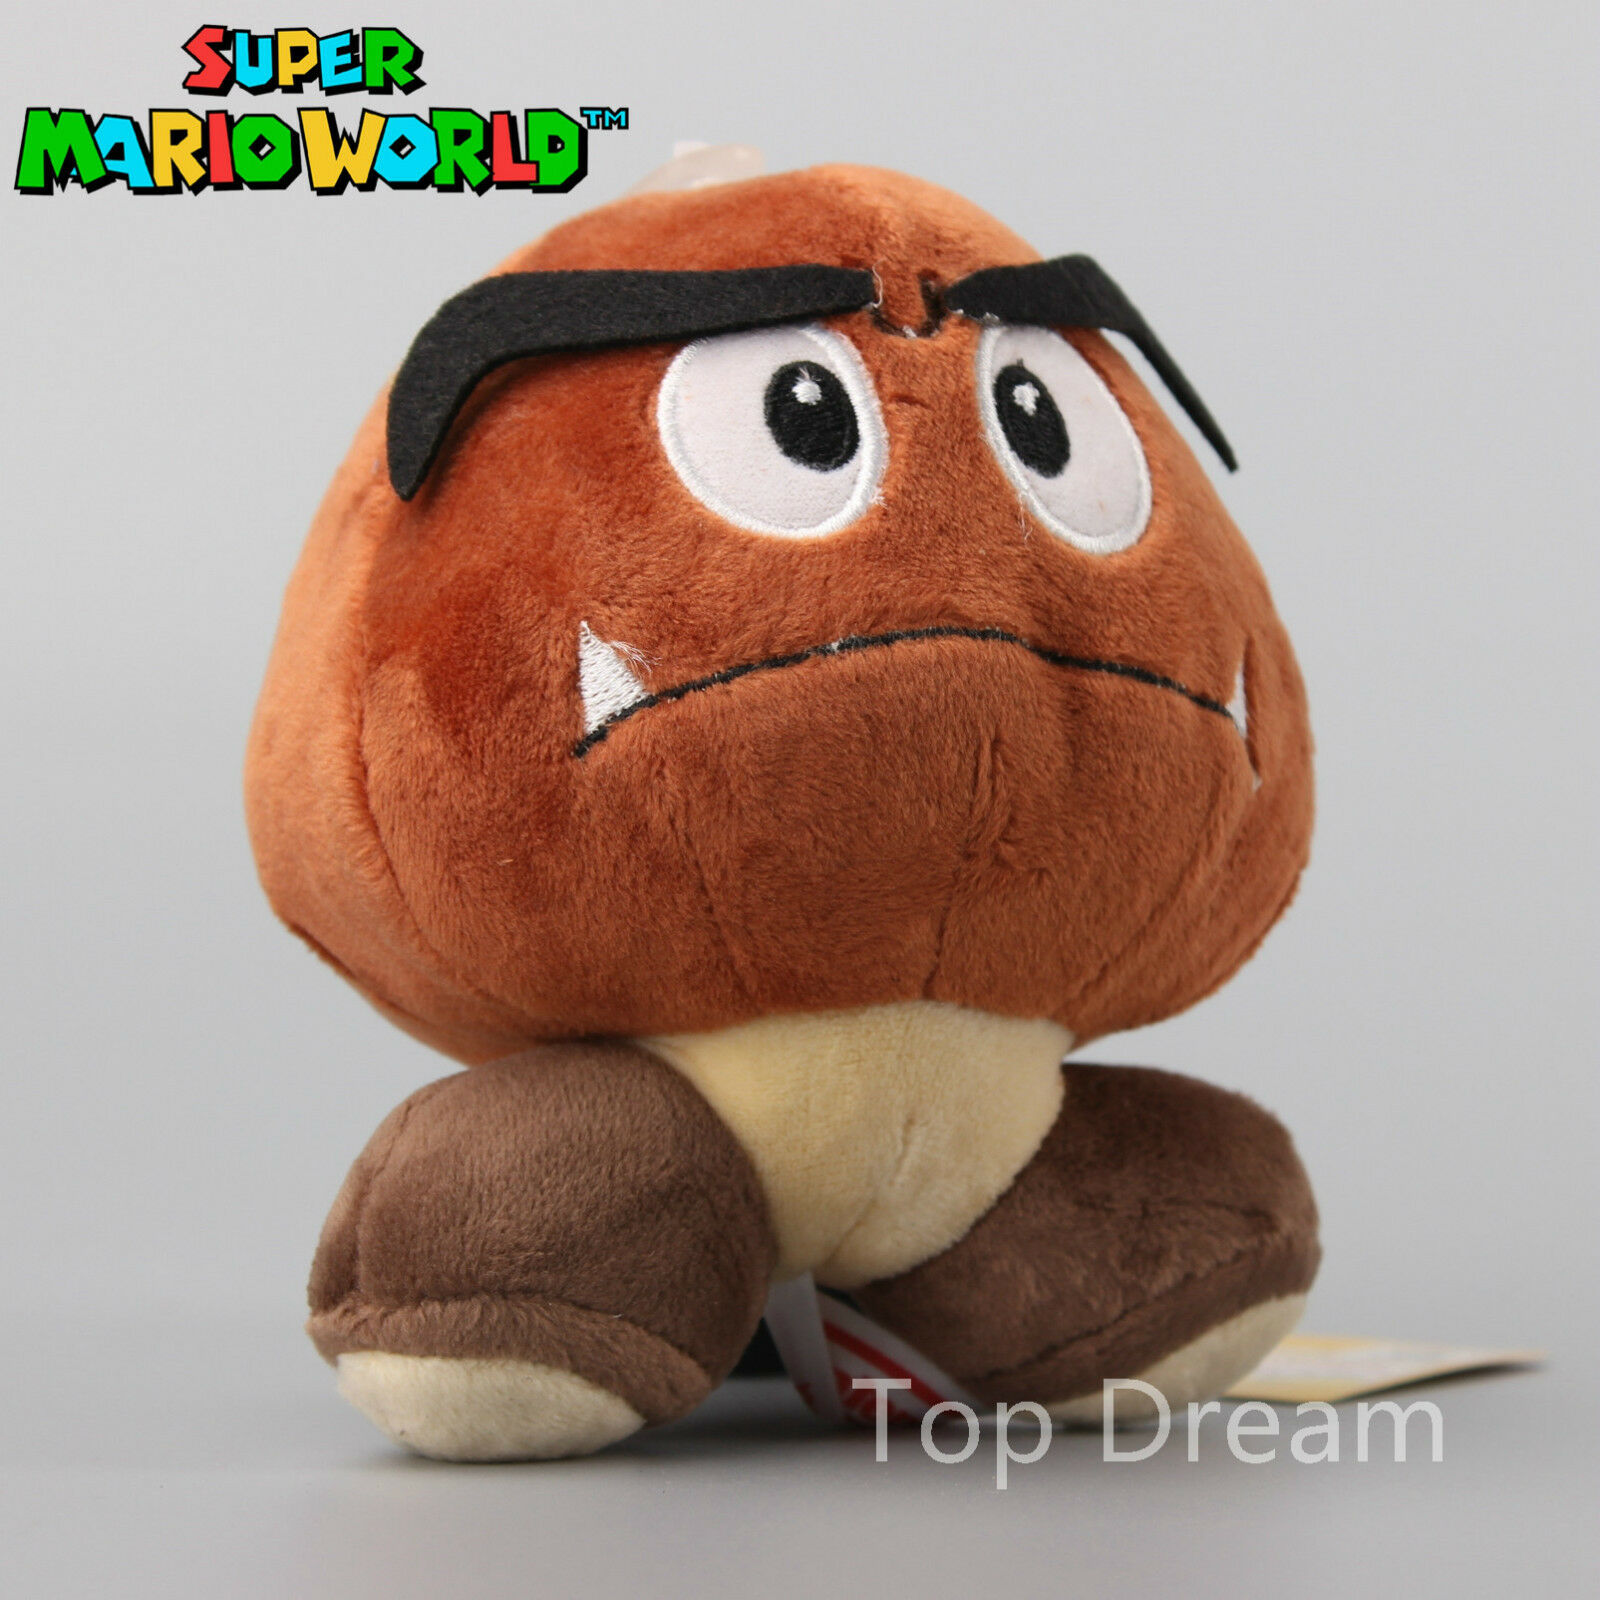 Super Mario Bro Brown Goomba Plush Doll Standing Soft Mushroom